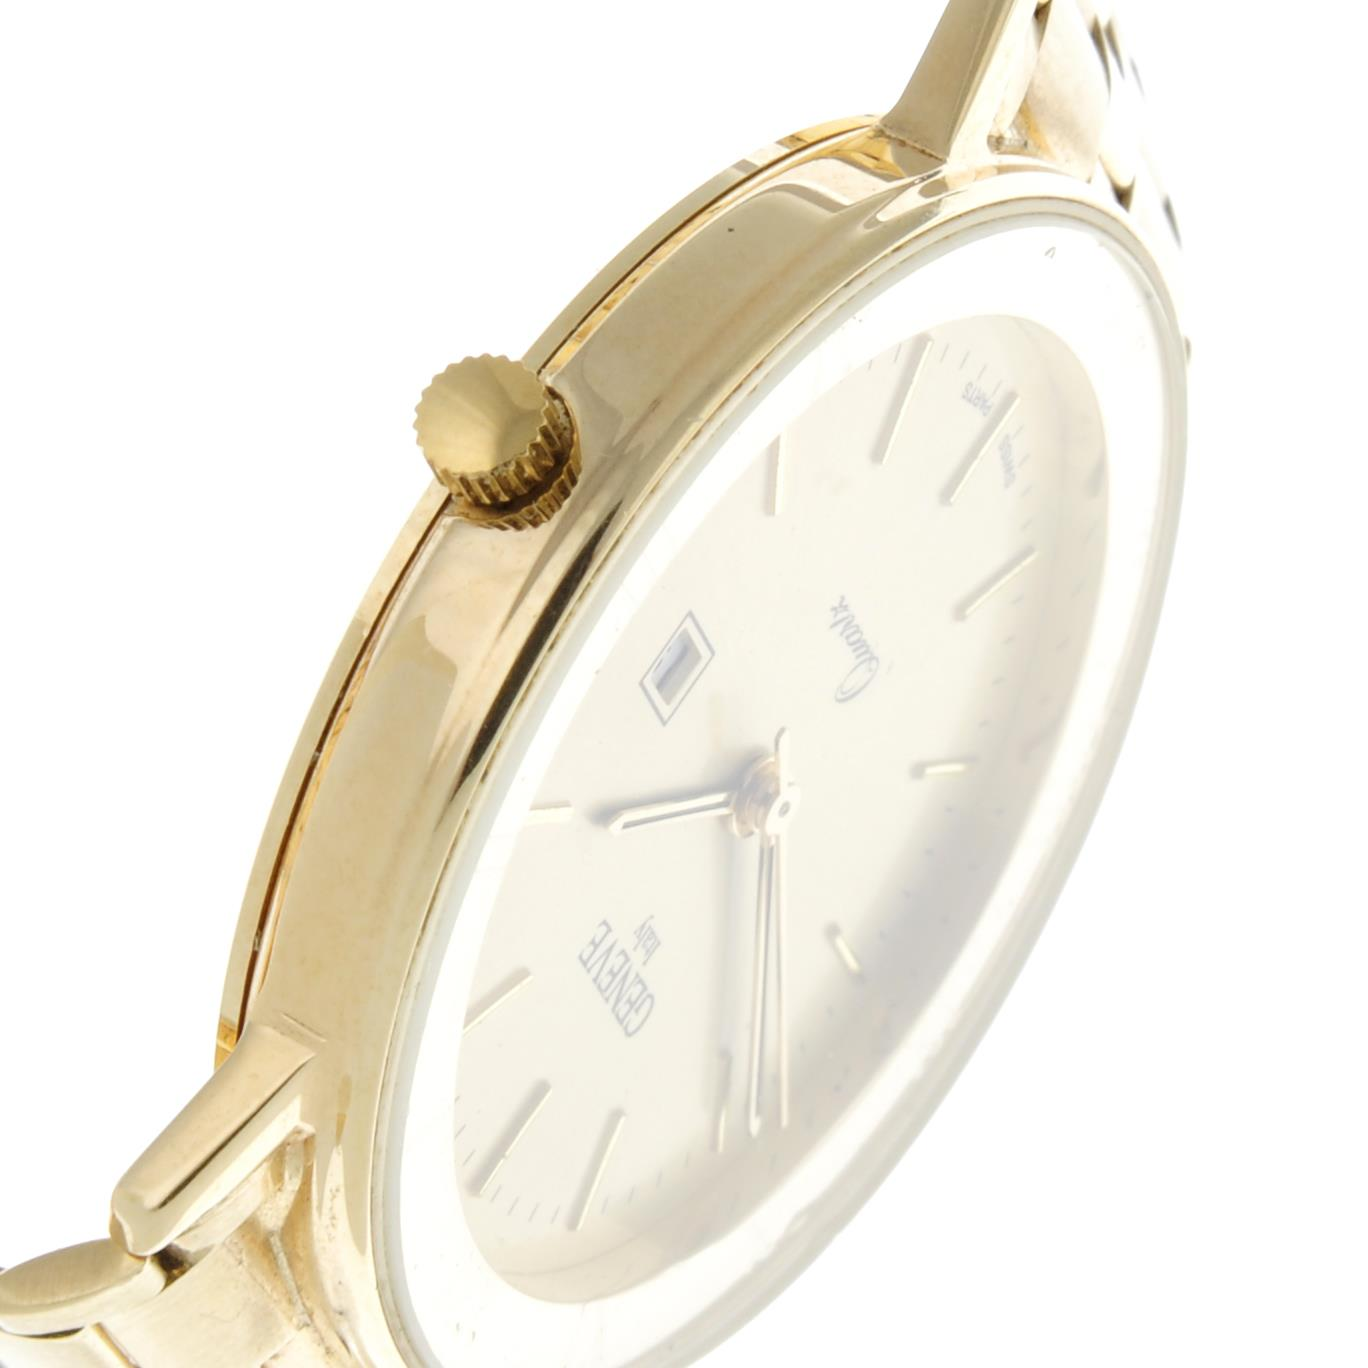 GENEVE - a bracelet watch. - Image 4 of 5